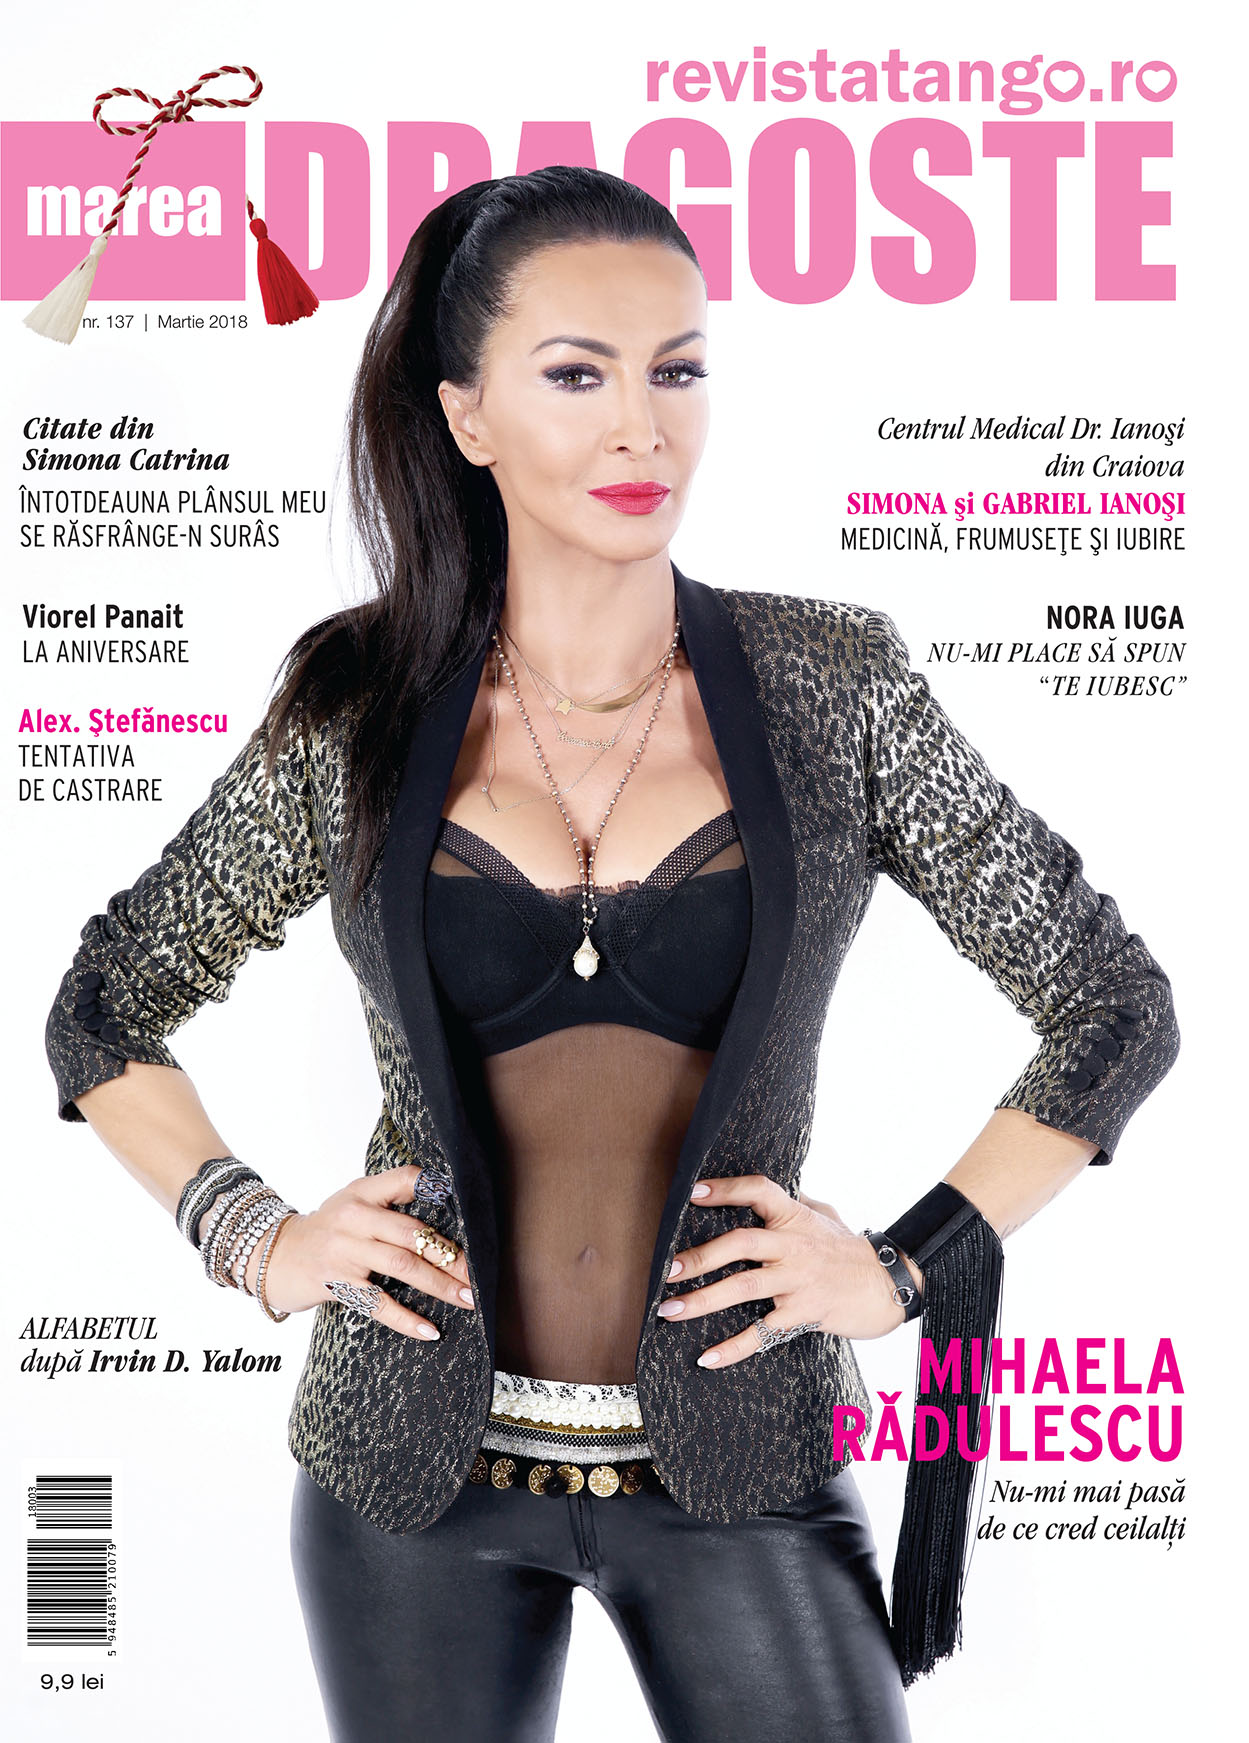 Mihaela Radulescu pe coperta Marea Dragoste-revistatango.ro, nr. 137, martie 2018